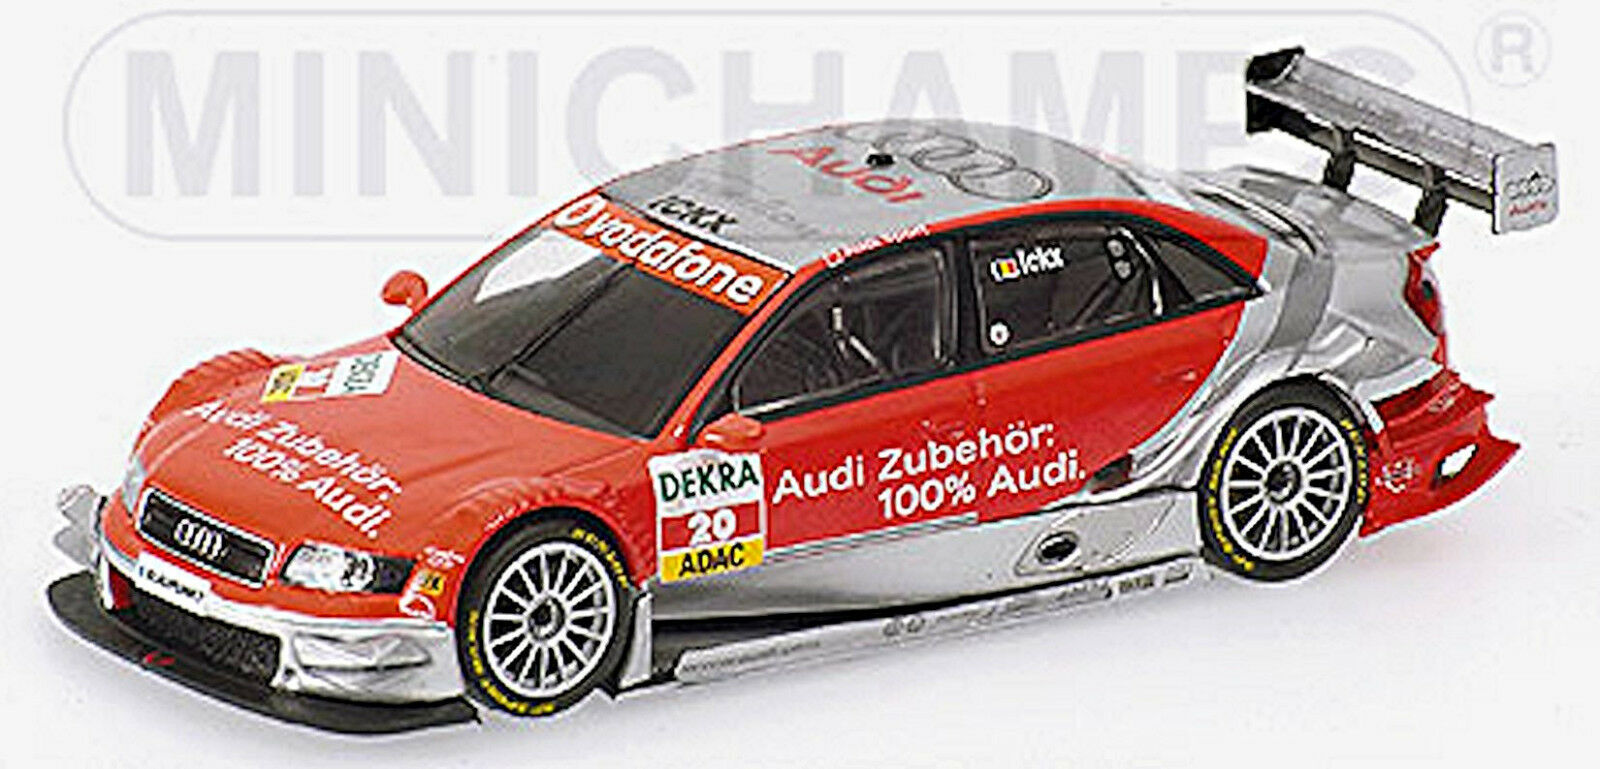 Audi a 4 DTM 2006 V. Ickx  20 Equipo Midland 100% Audi 1 43 minichamps